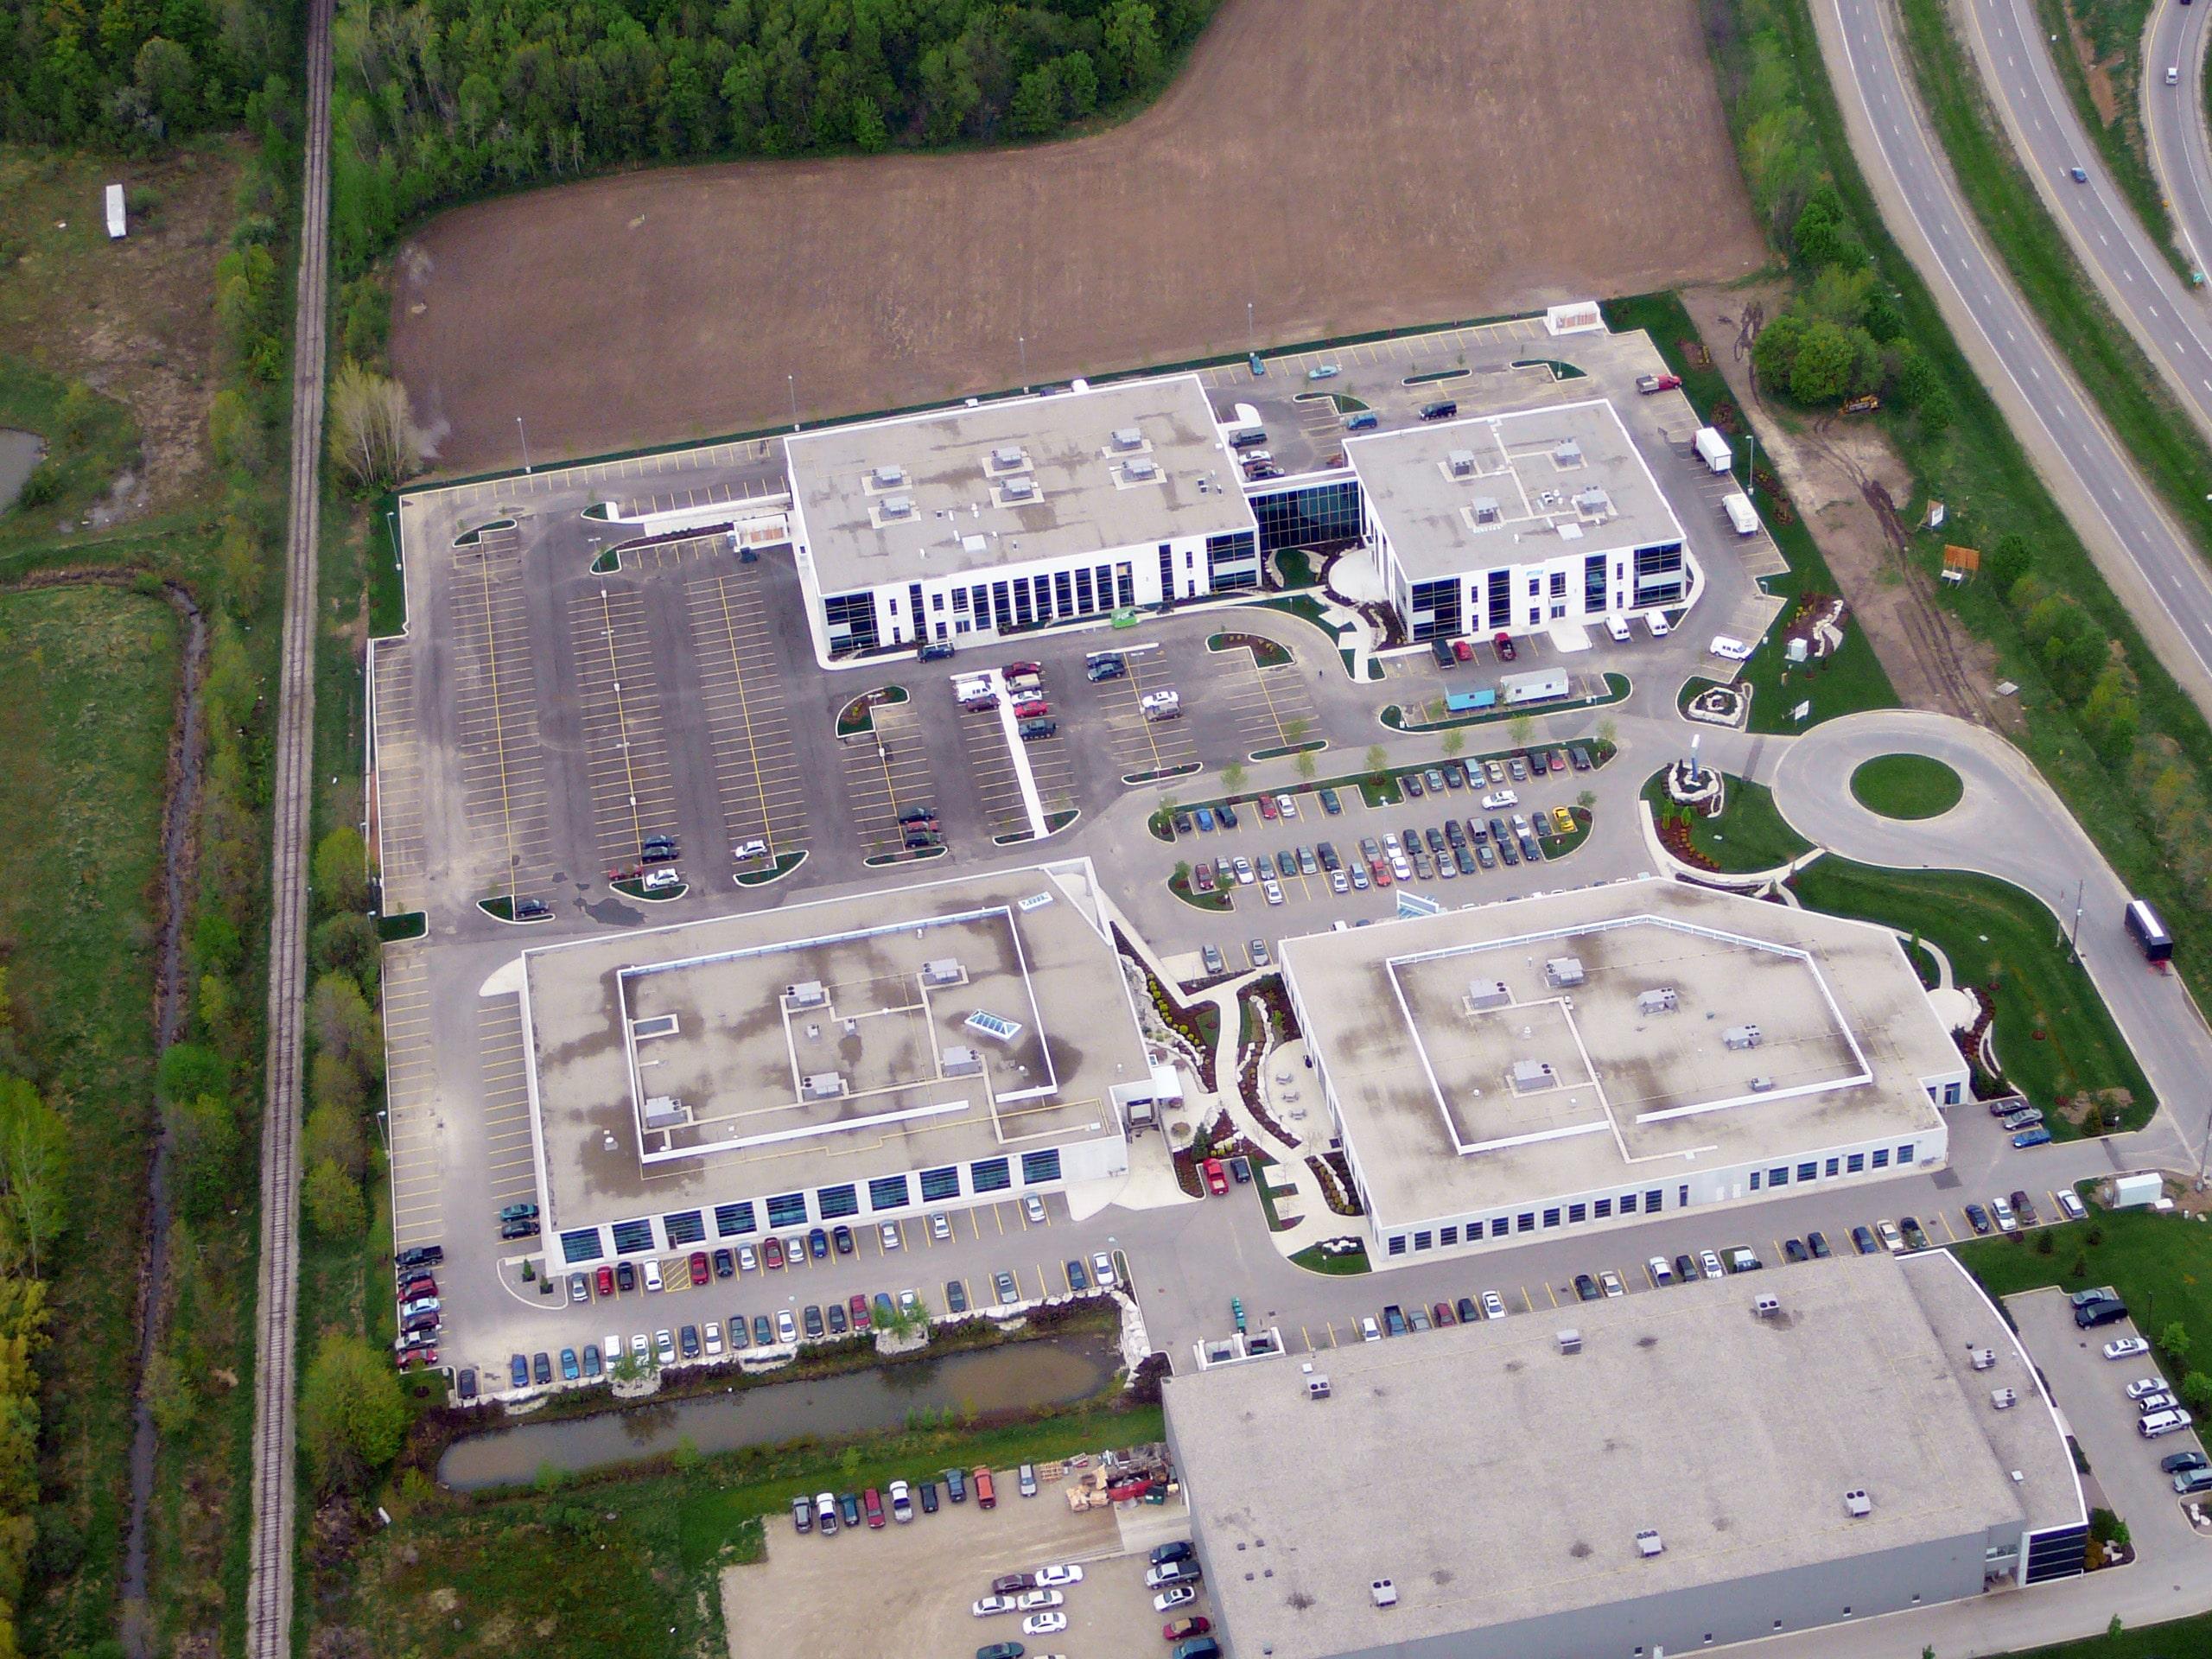 Kumpf Drive Aerial 4 - 16-5-2007